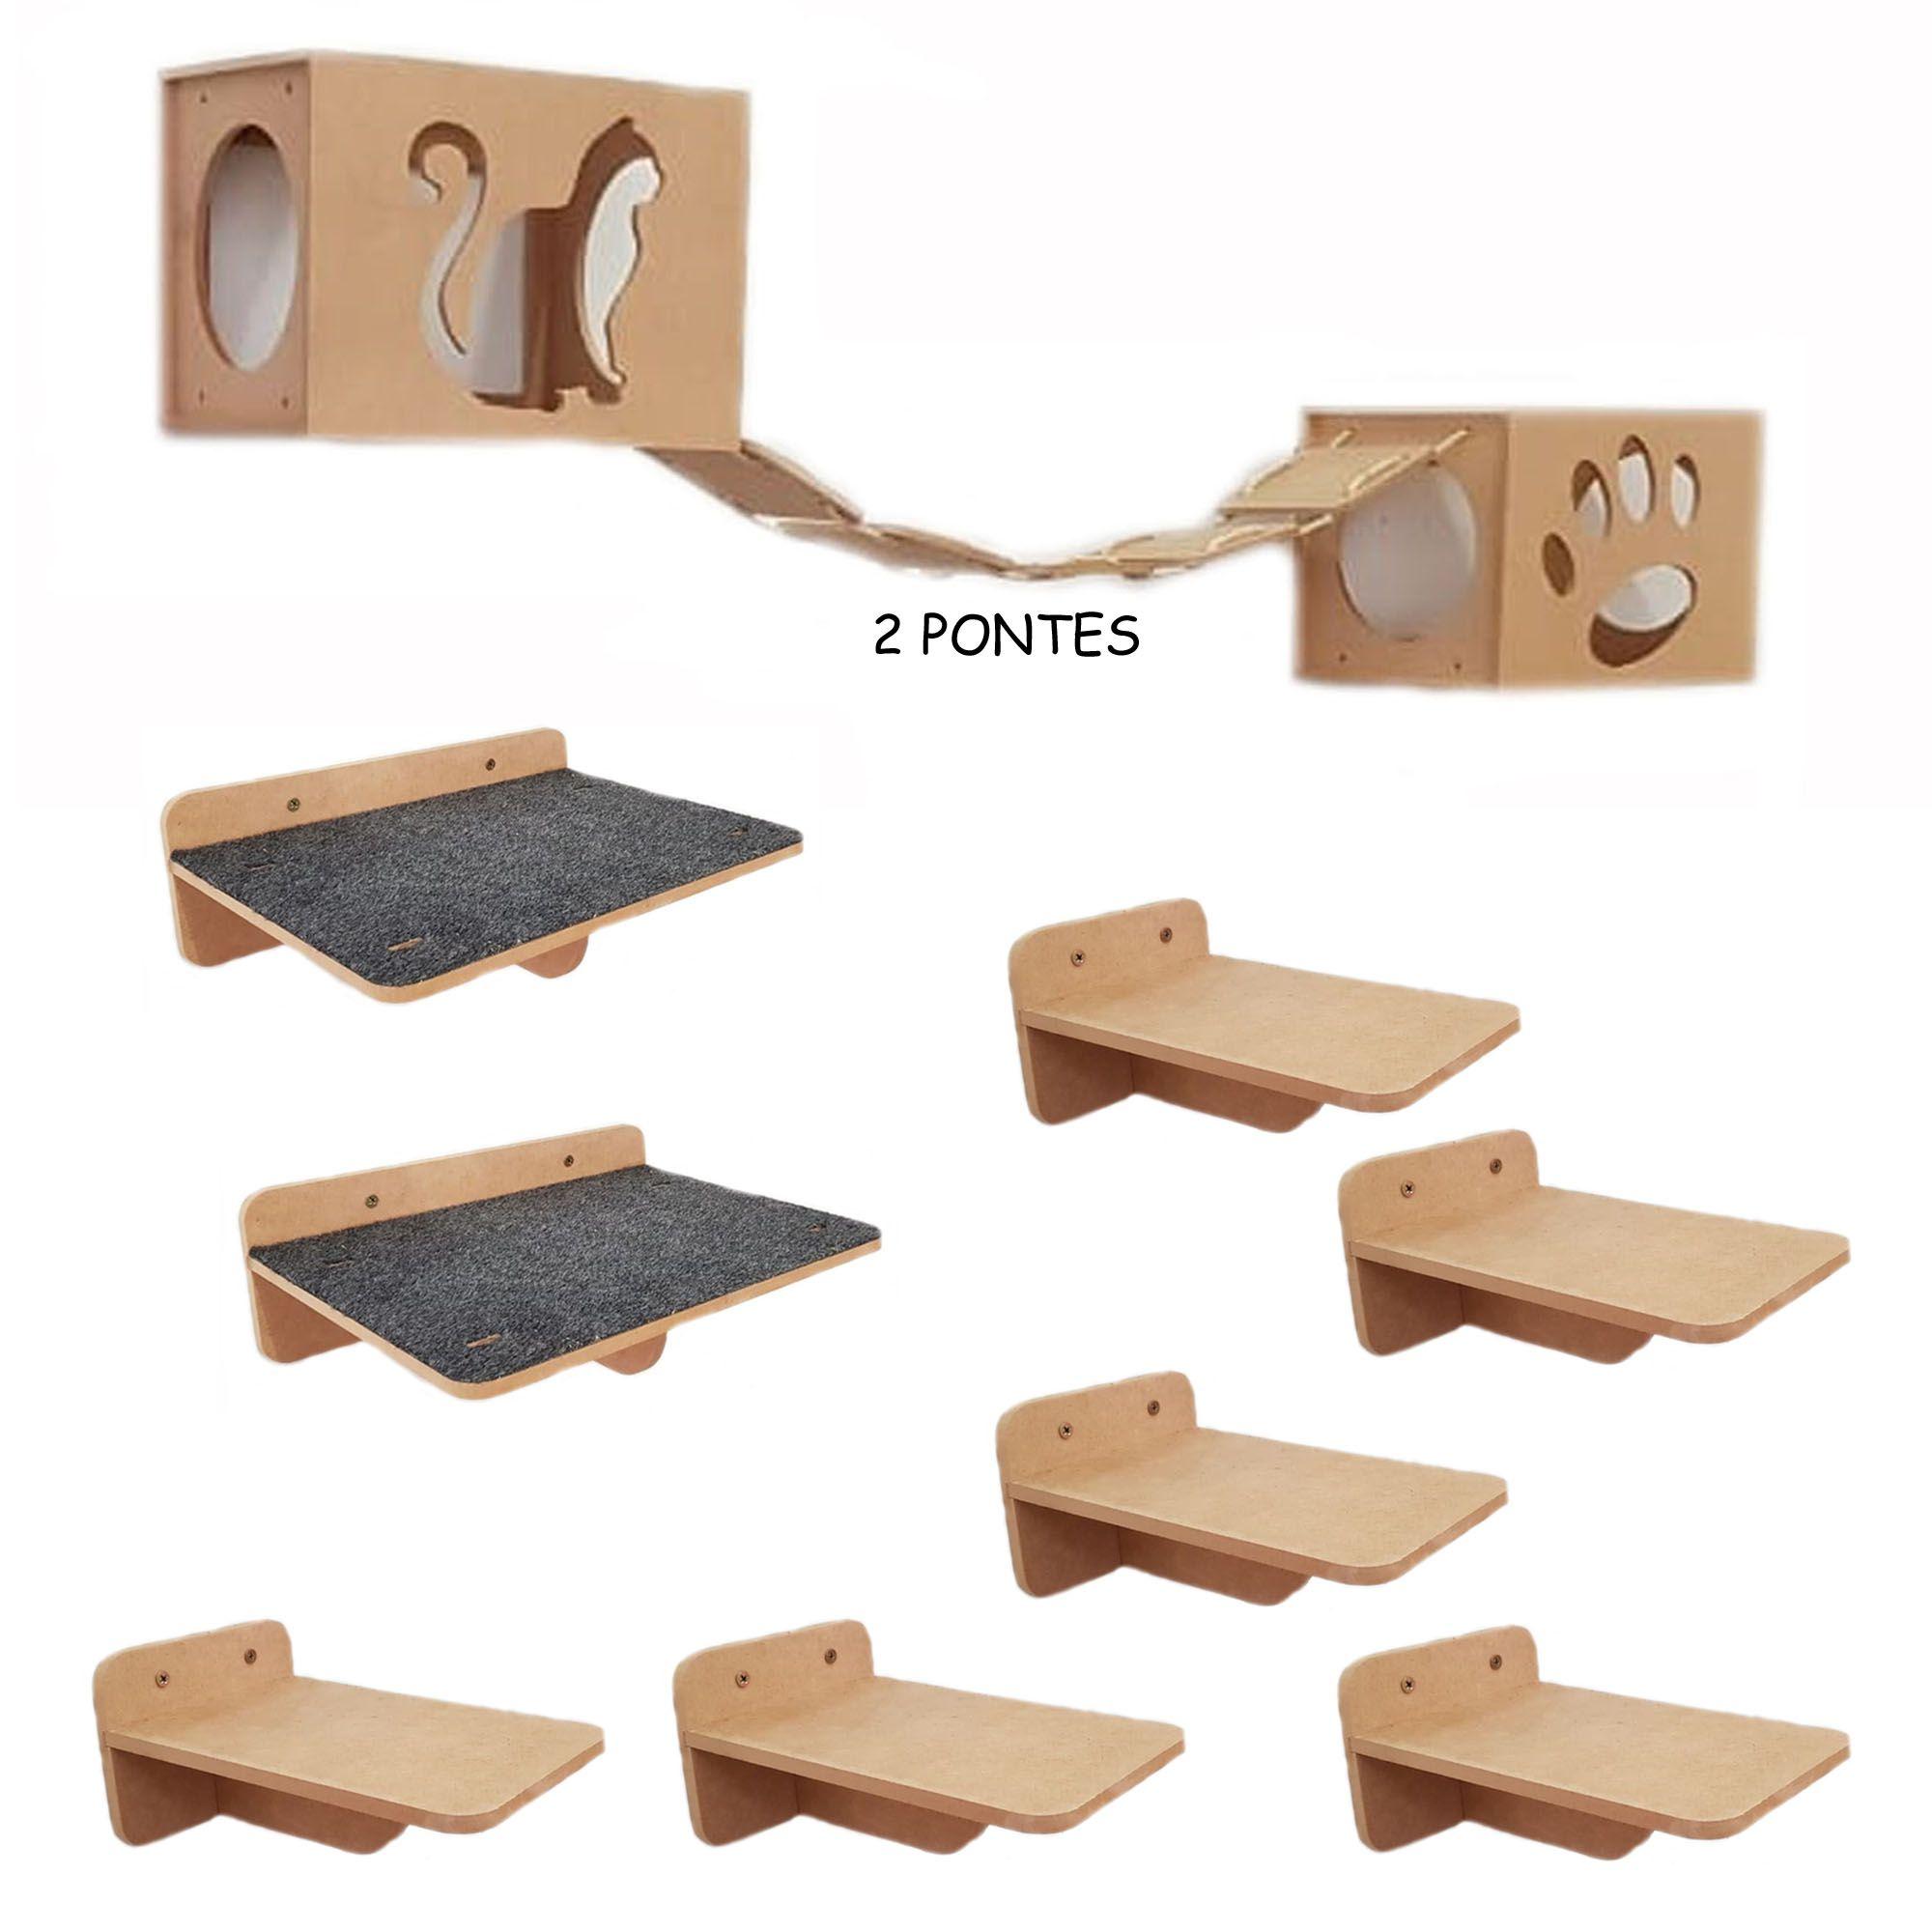 Kit Nicho Gato 12 pçs - 2 Nichos + 2 prateleiras + 2 pontes + 6 Degraus - MDF 9mm